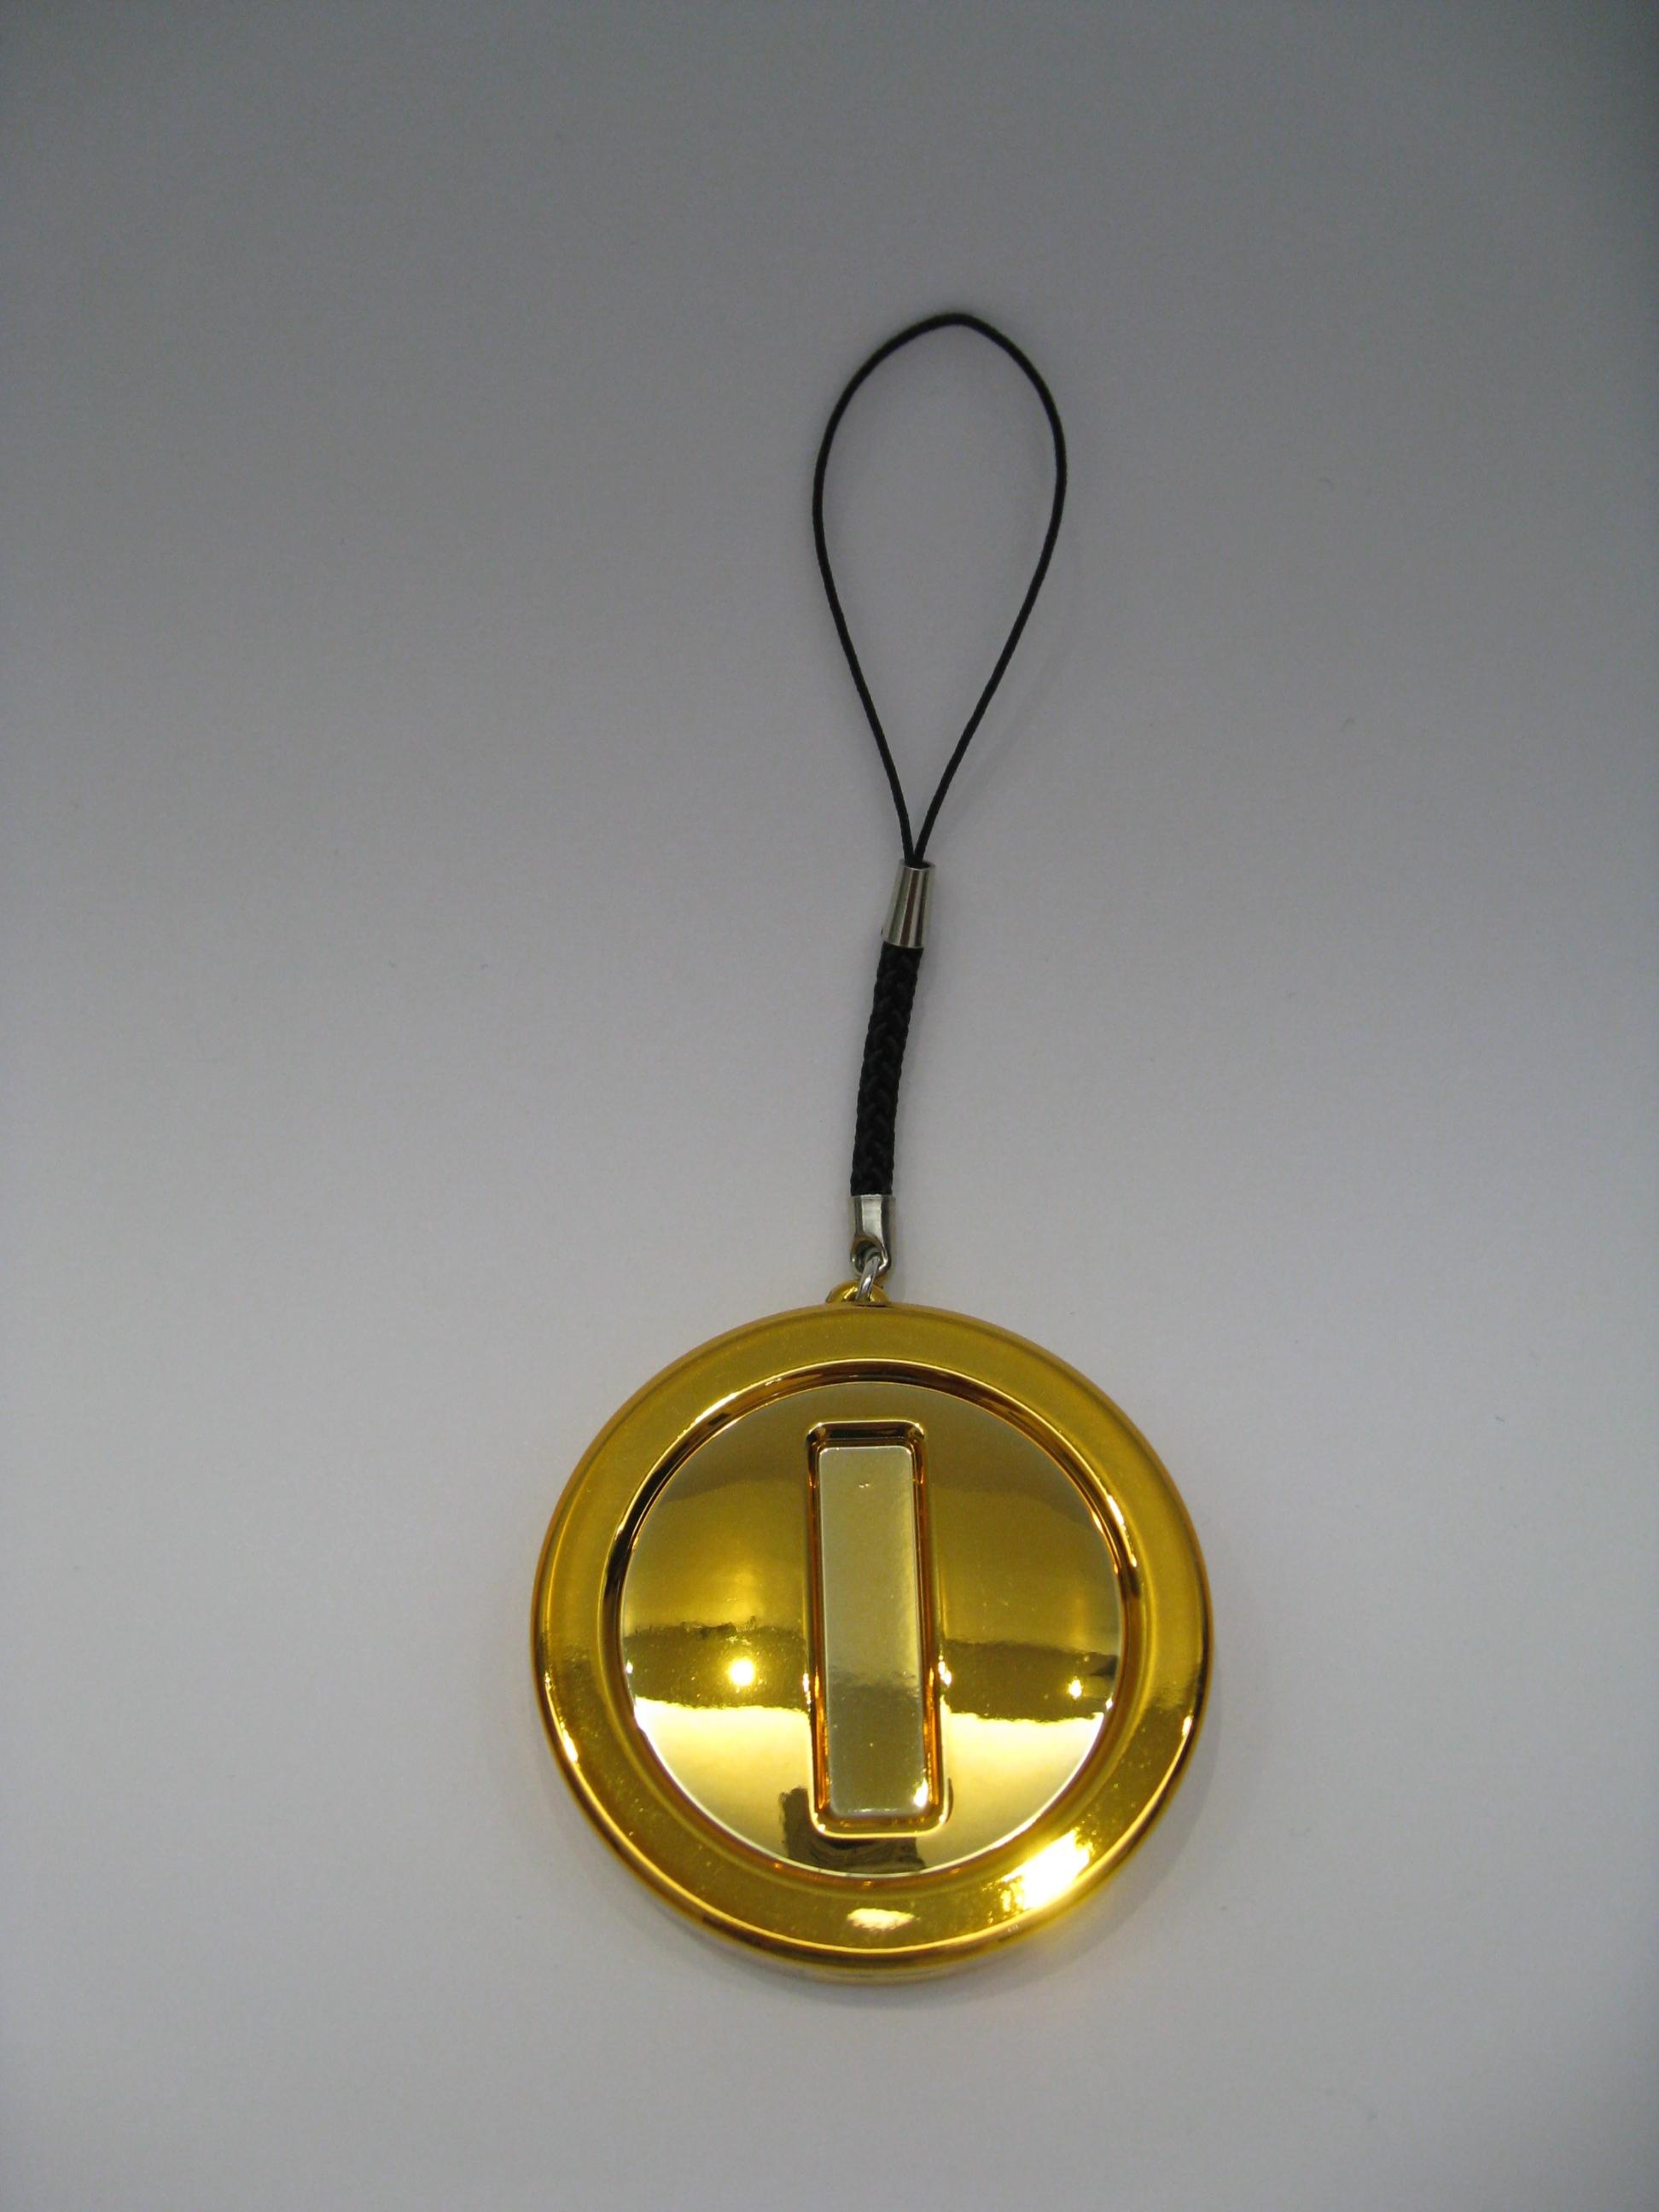 Cryptoforecast coin reddit 3ds - Dft coins twitter username